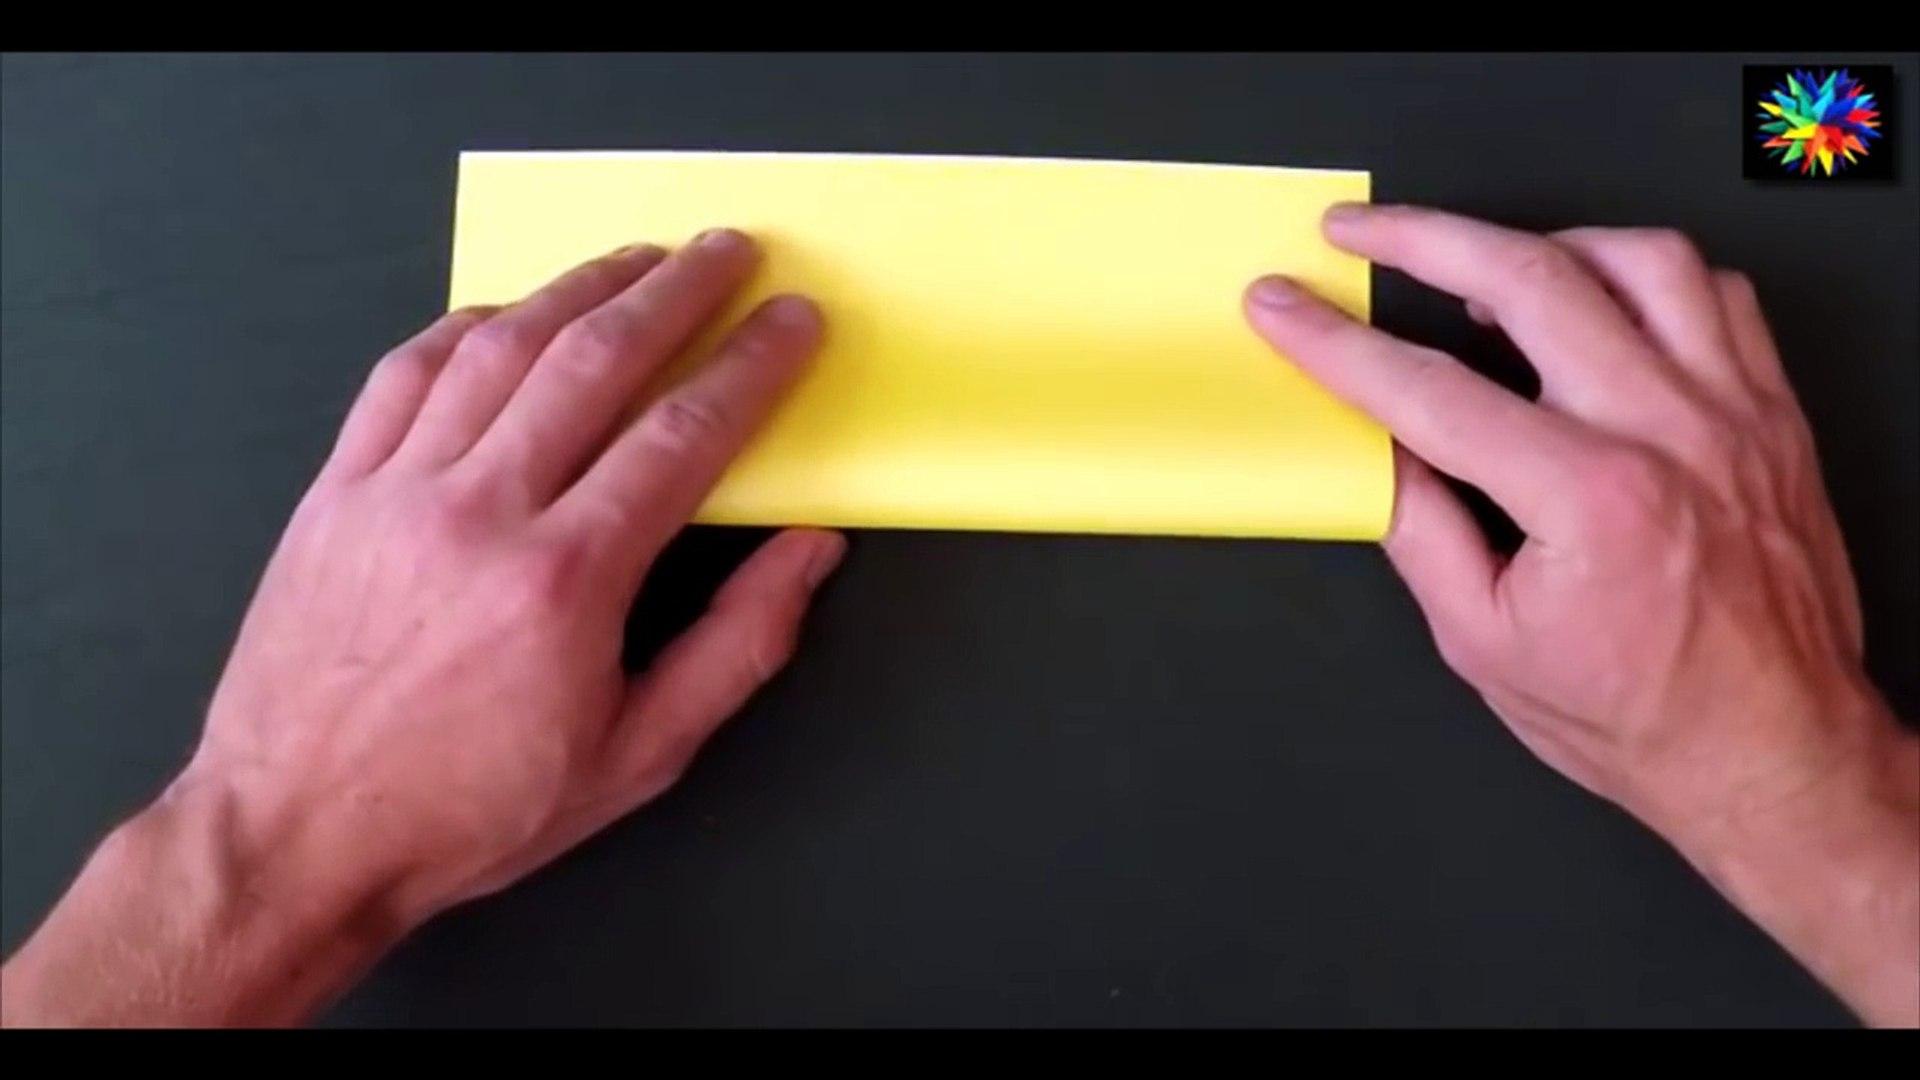 How to make a paper crown Origami / Как сделать корону из бумаги Оригами